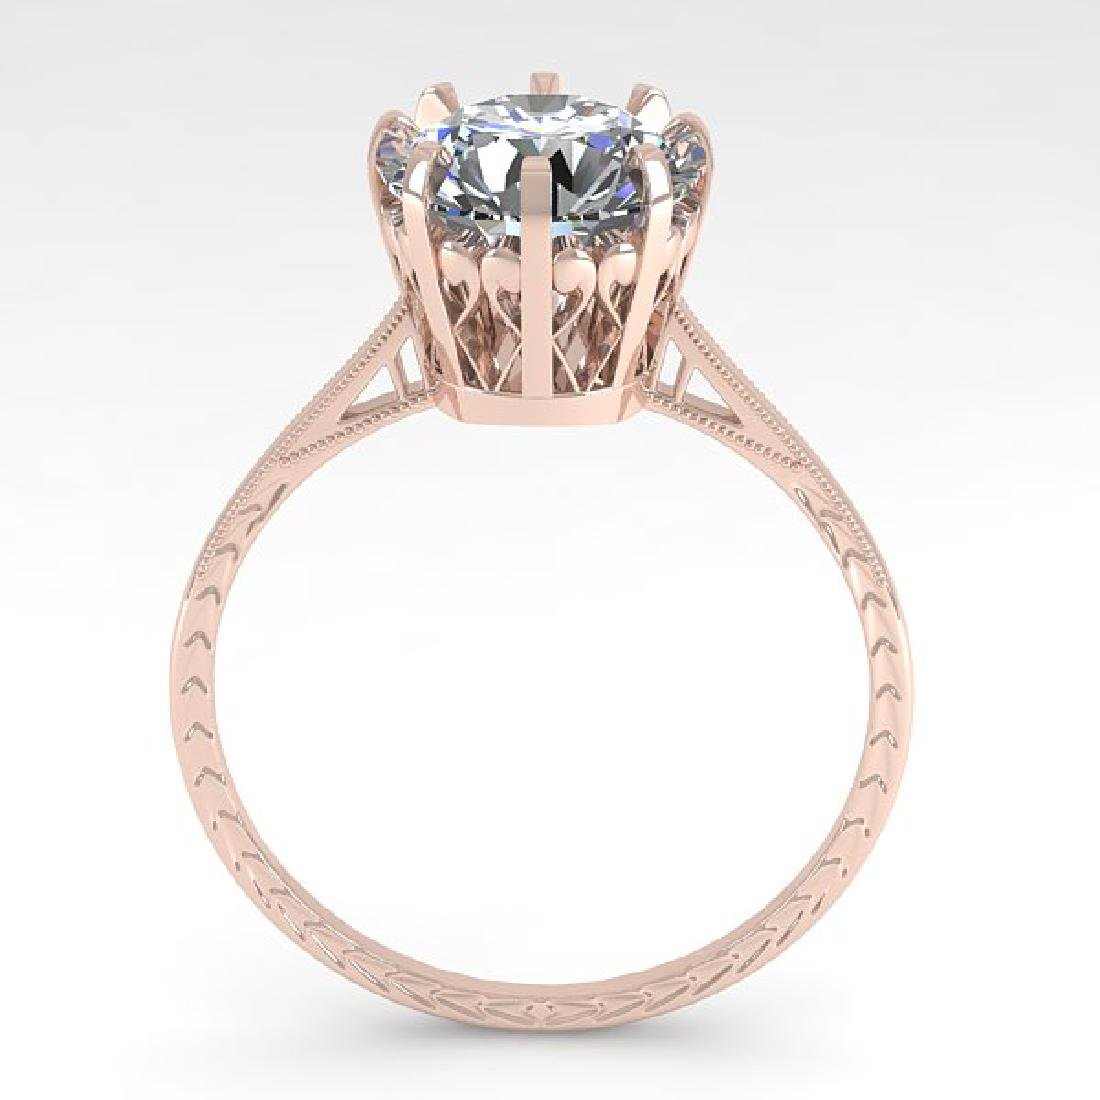 2.03 CTW Certified VS/SI Diamond Engagement Ring 18K - 3